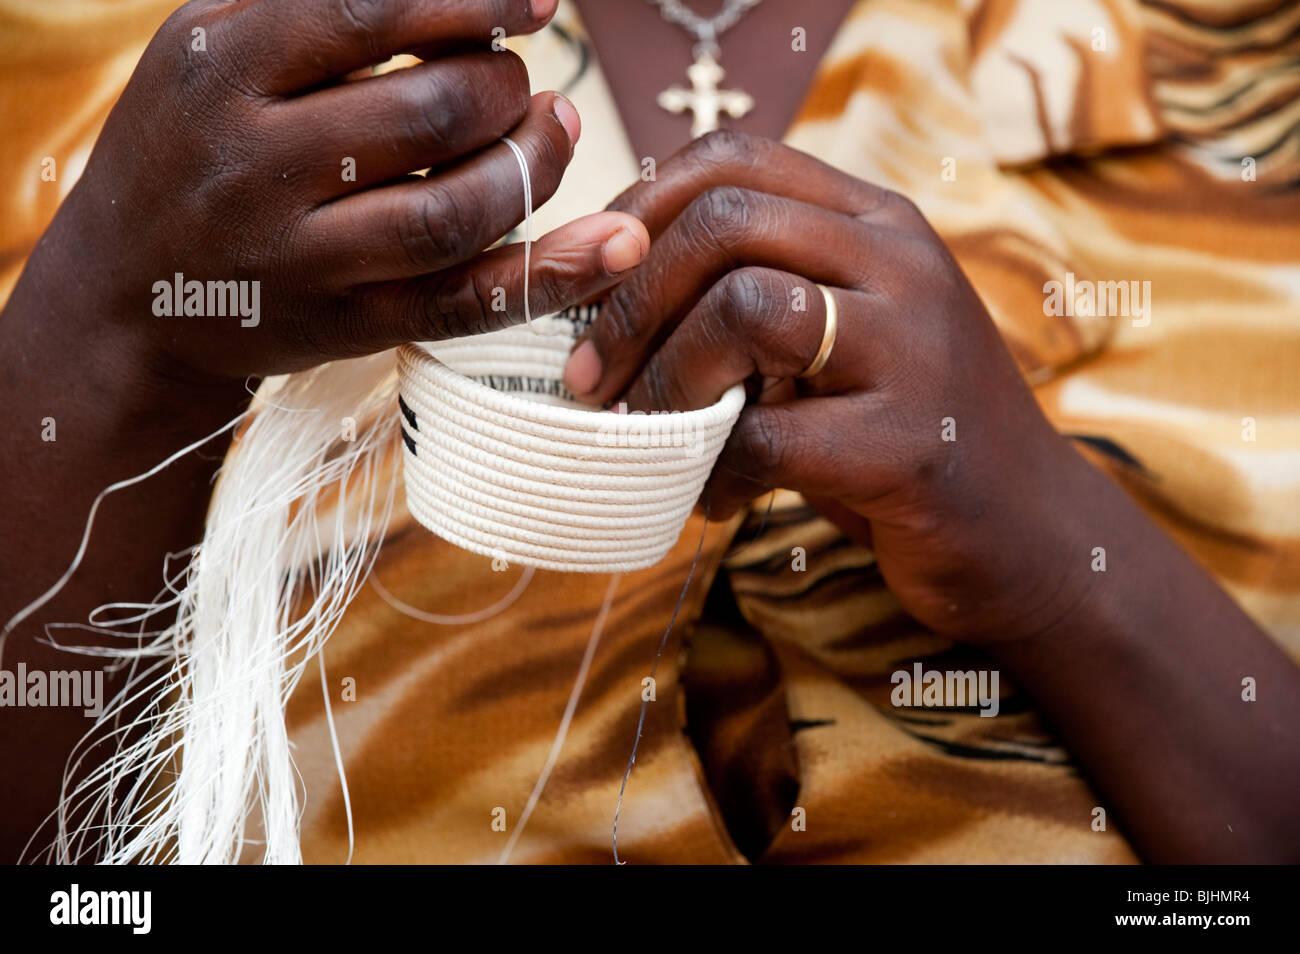 Lady weaving a traditional basket. Rwanda. - Stock Image